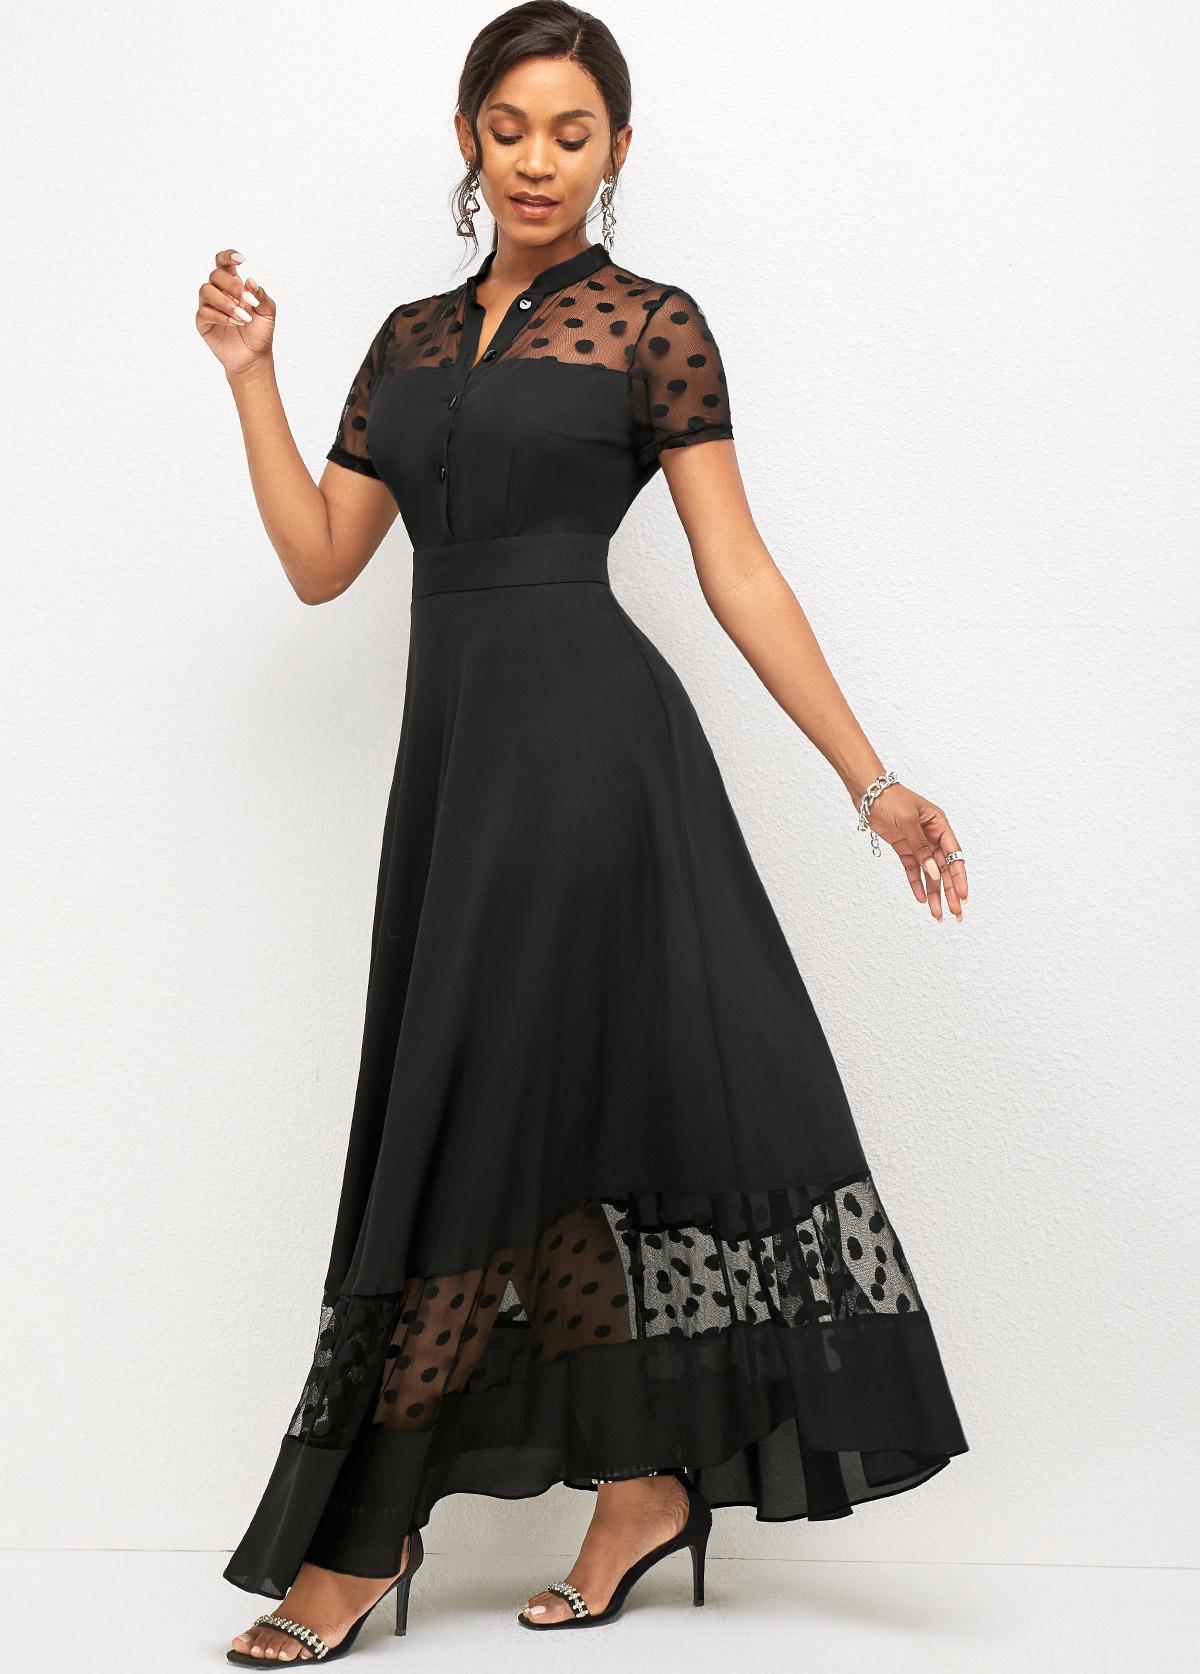 Polka Dot Mesh Stitching Short Sleeve Dress